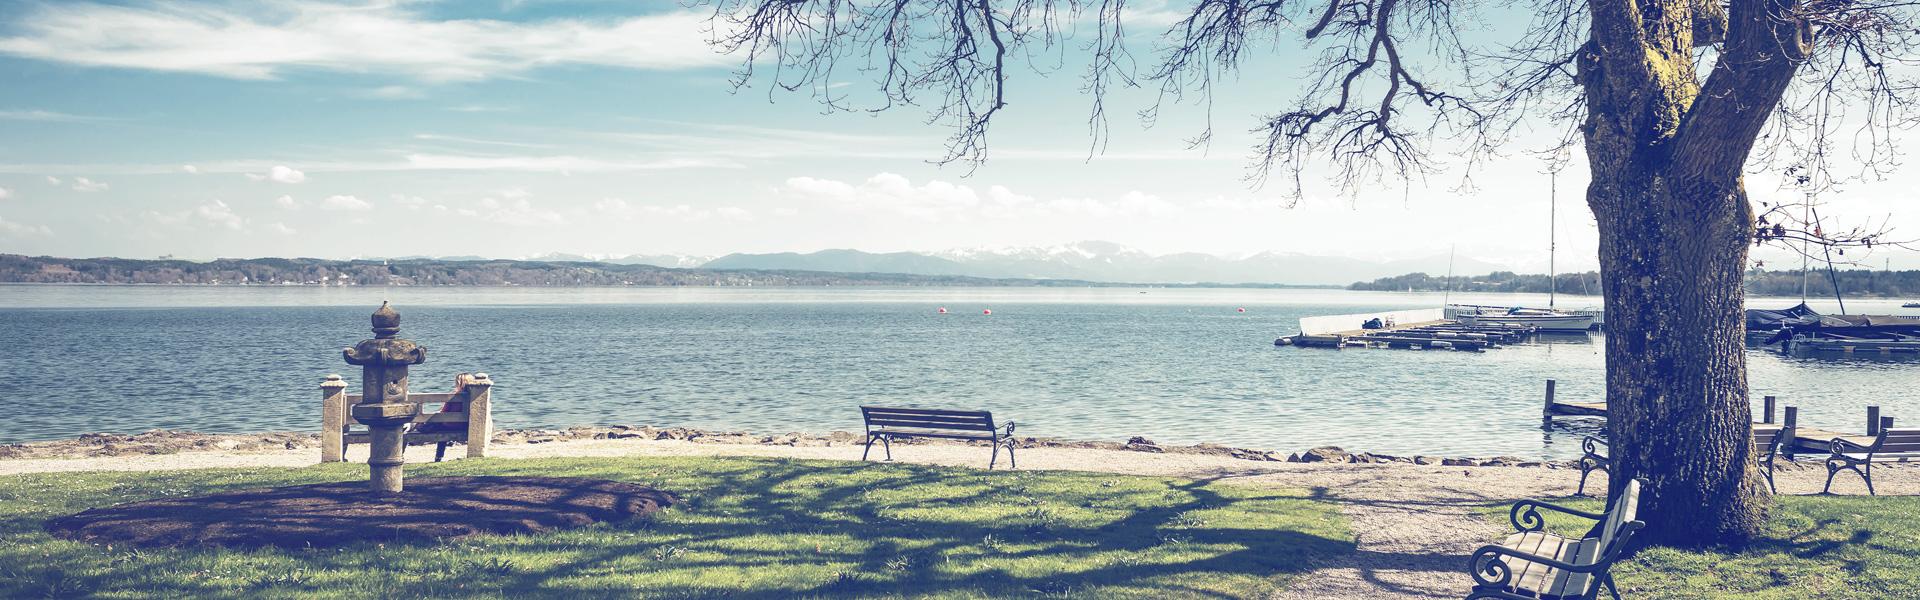 Hauptbild Starnberger See